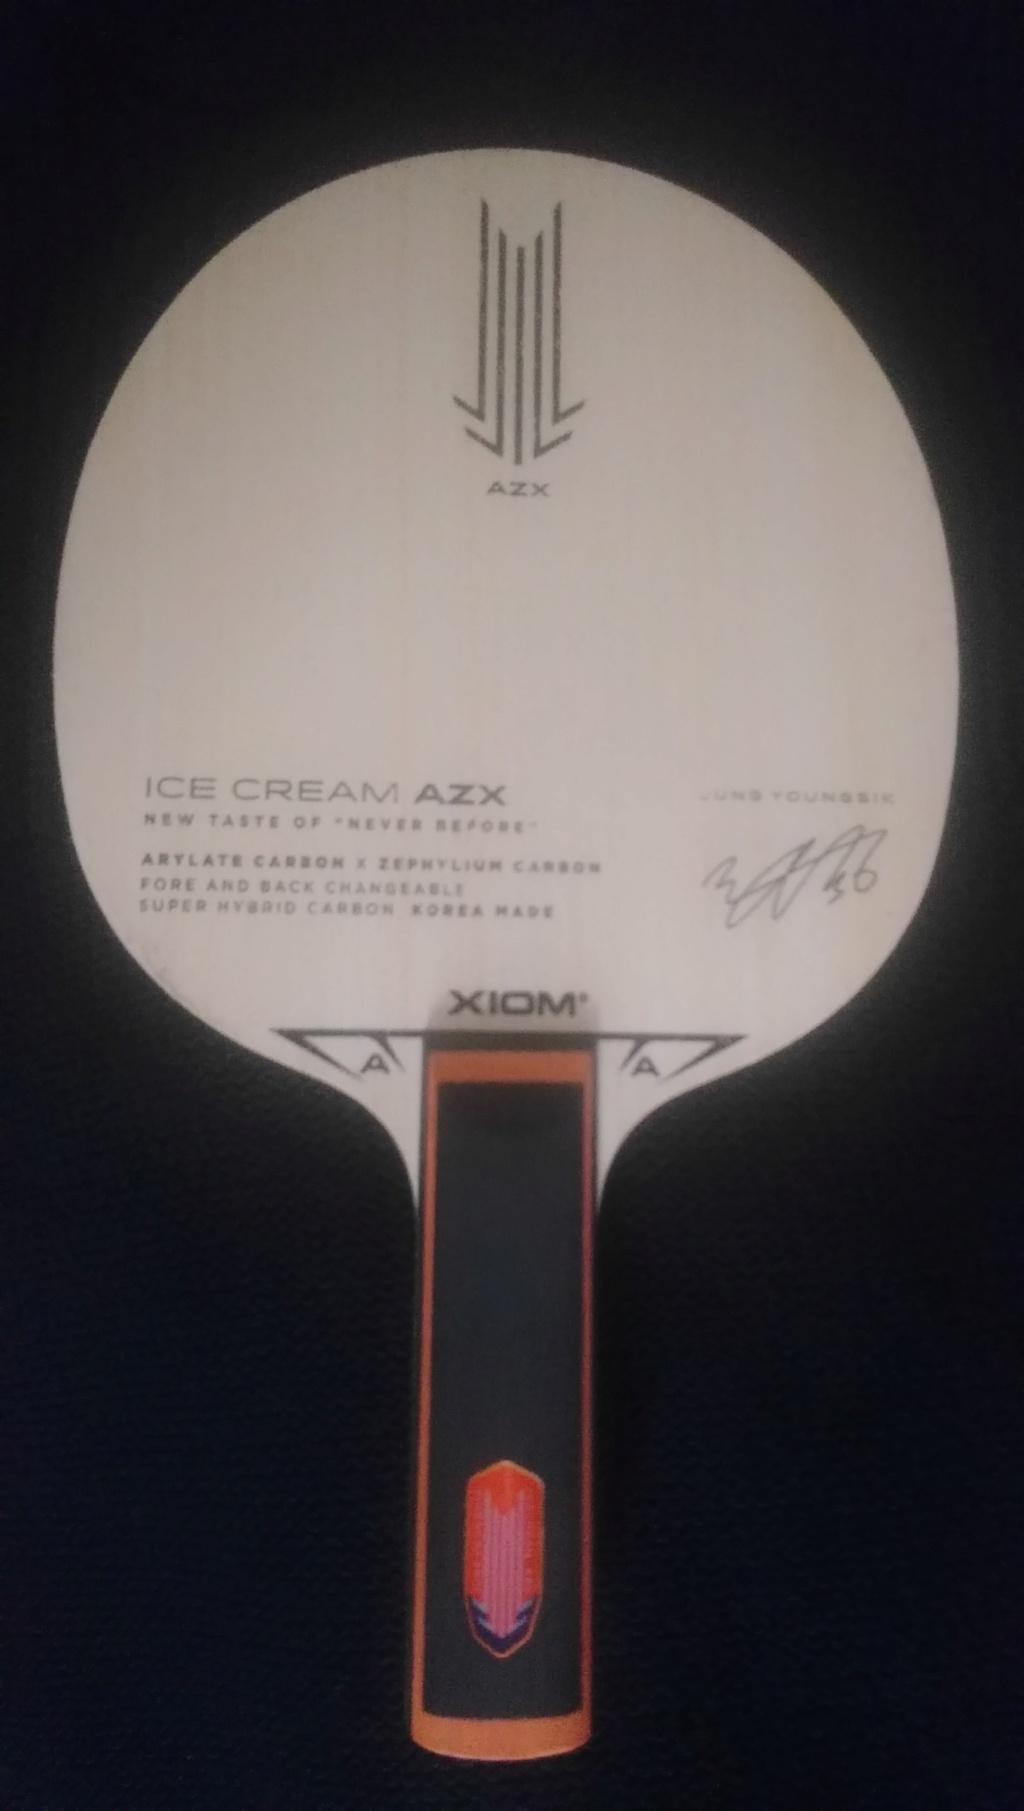 Xiom ice cream azx Azx210